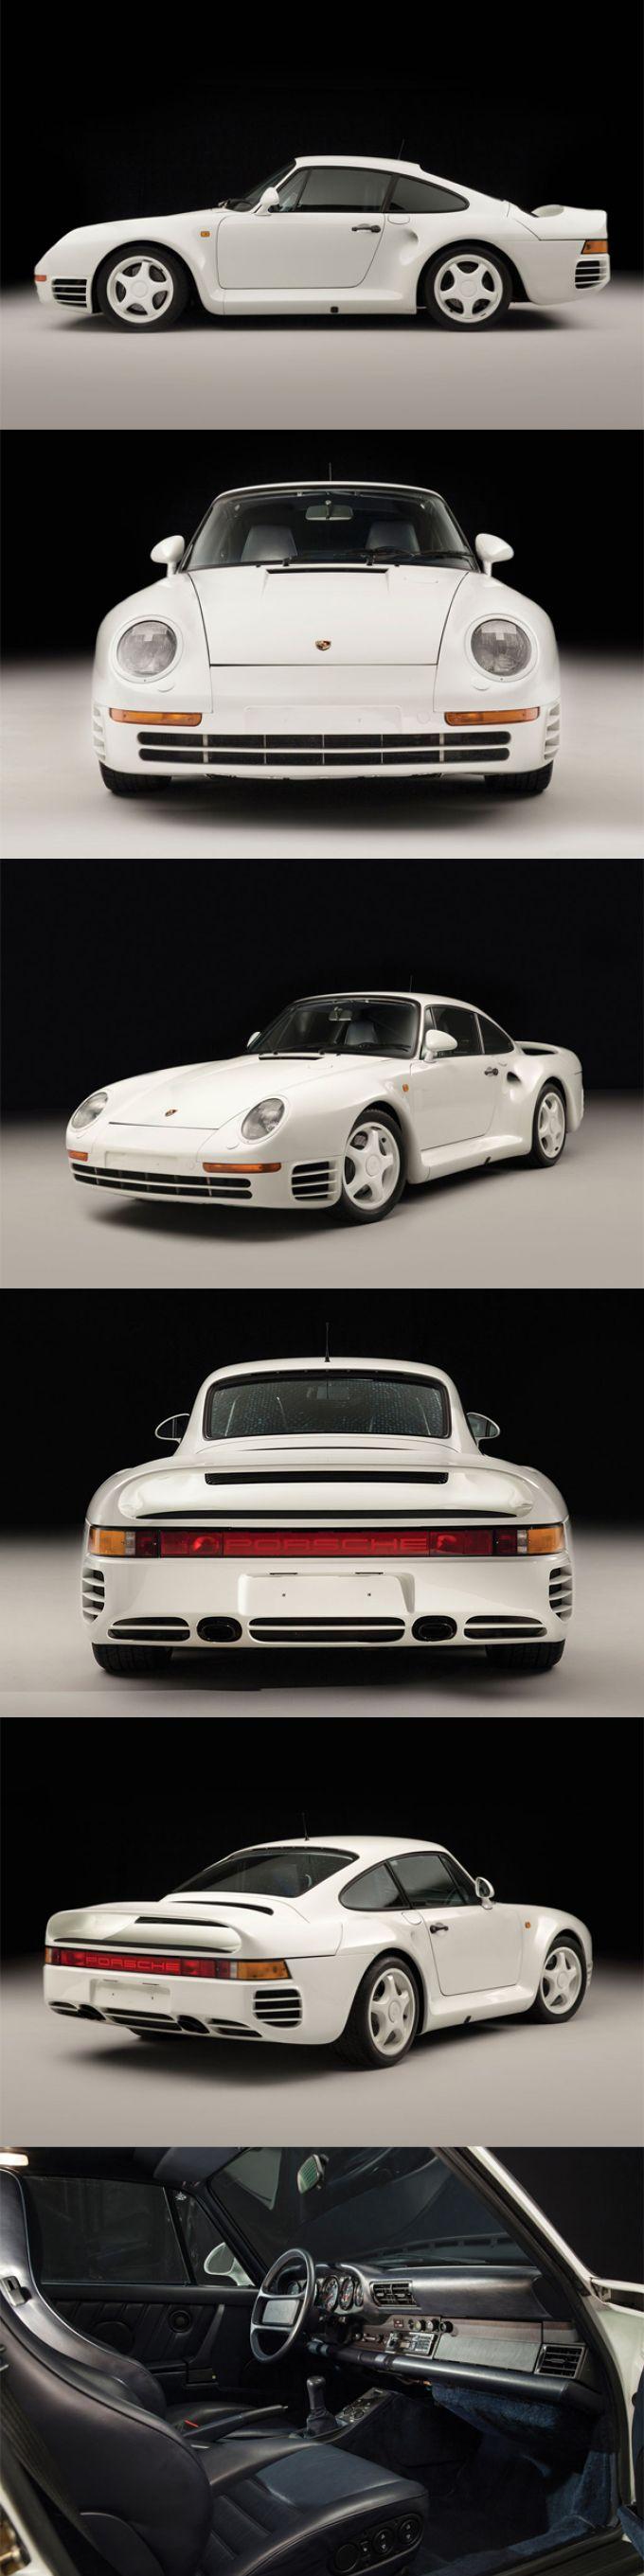 1986 Porsche 959 Komfort / 337 prod. / 444hp / Group B homologation / Germany / white